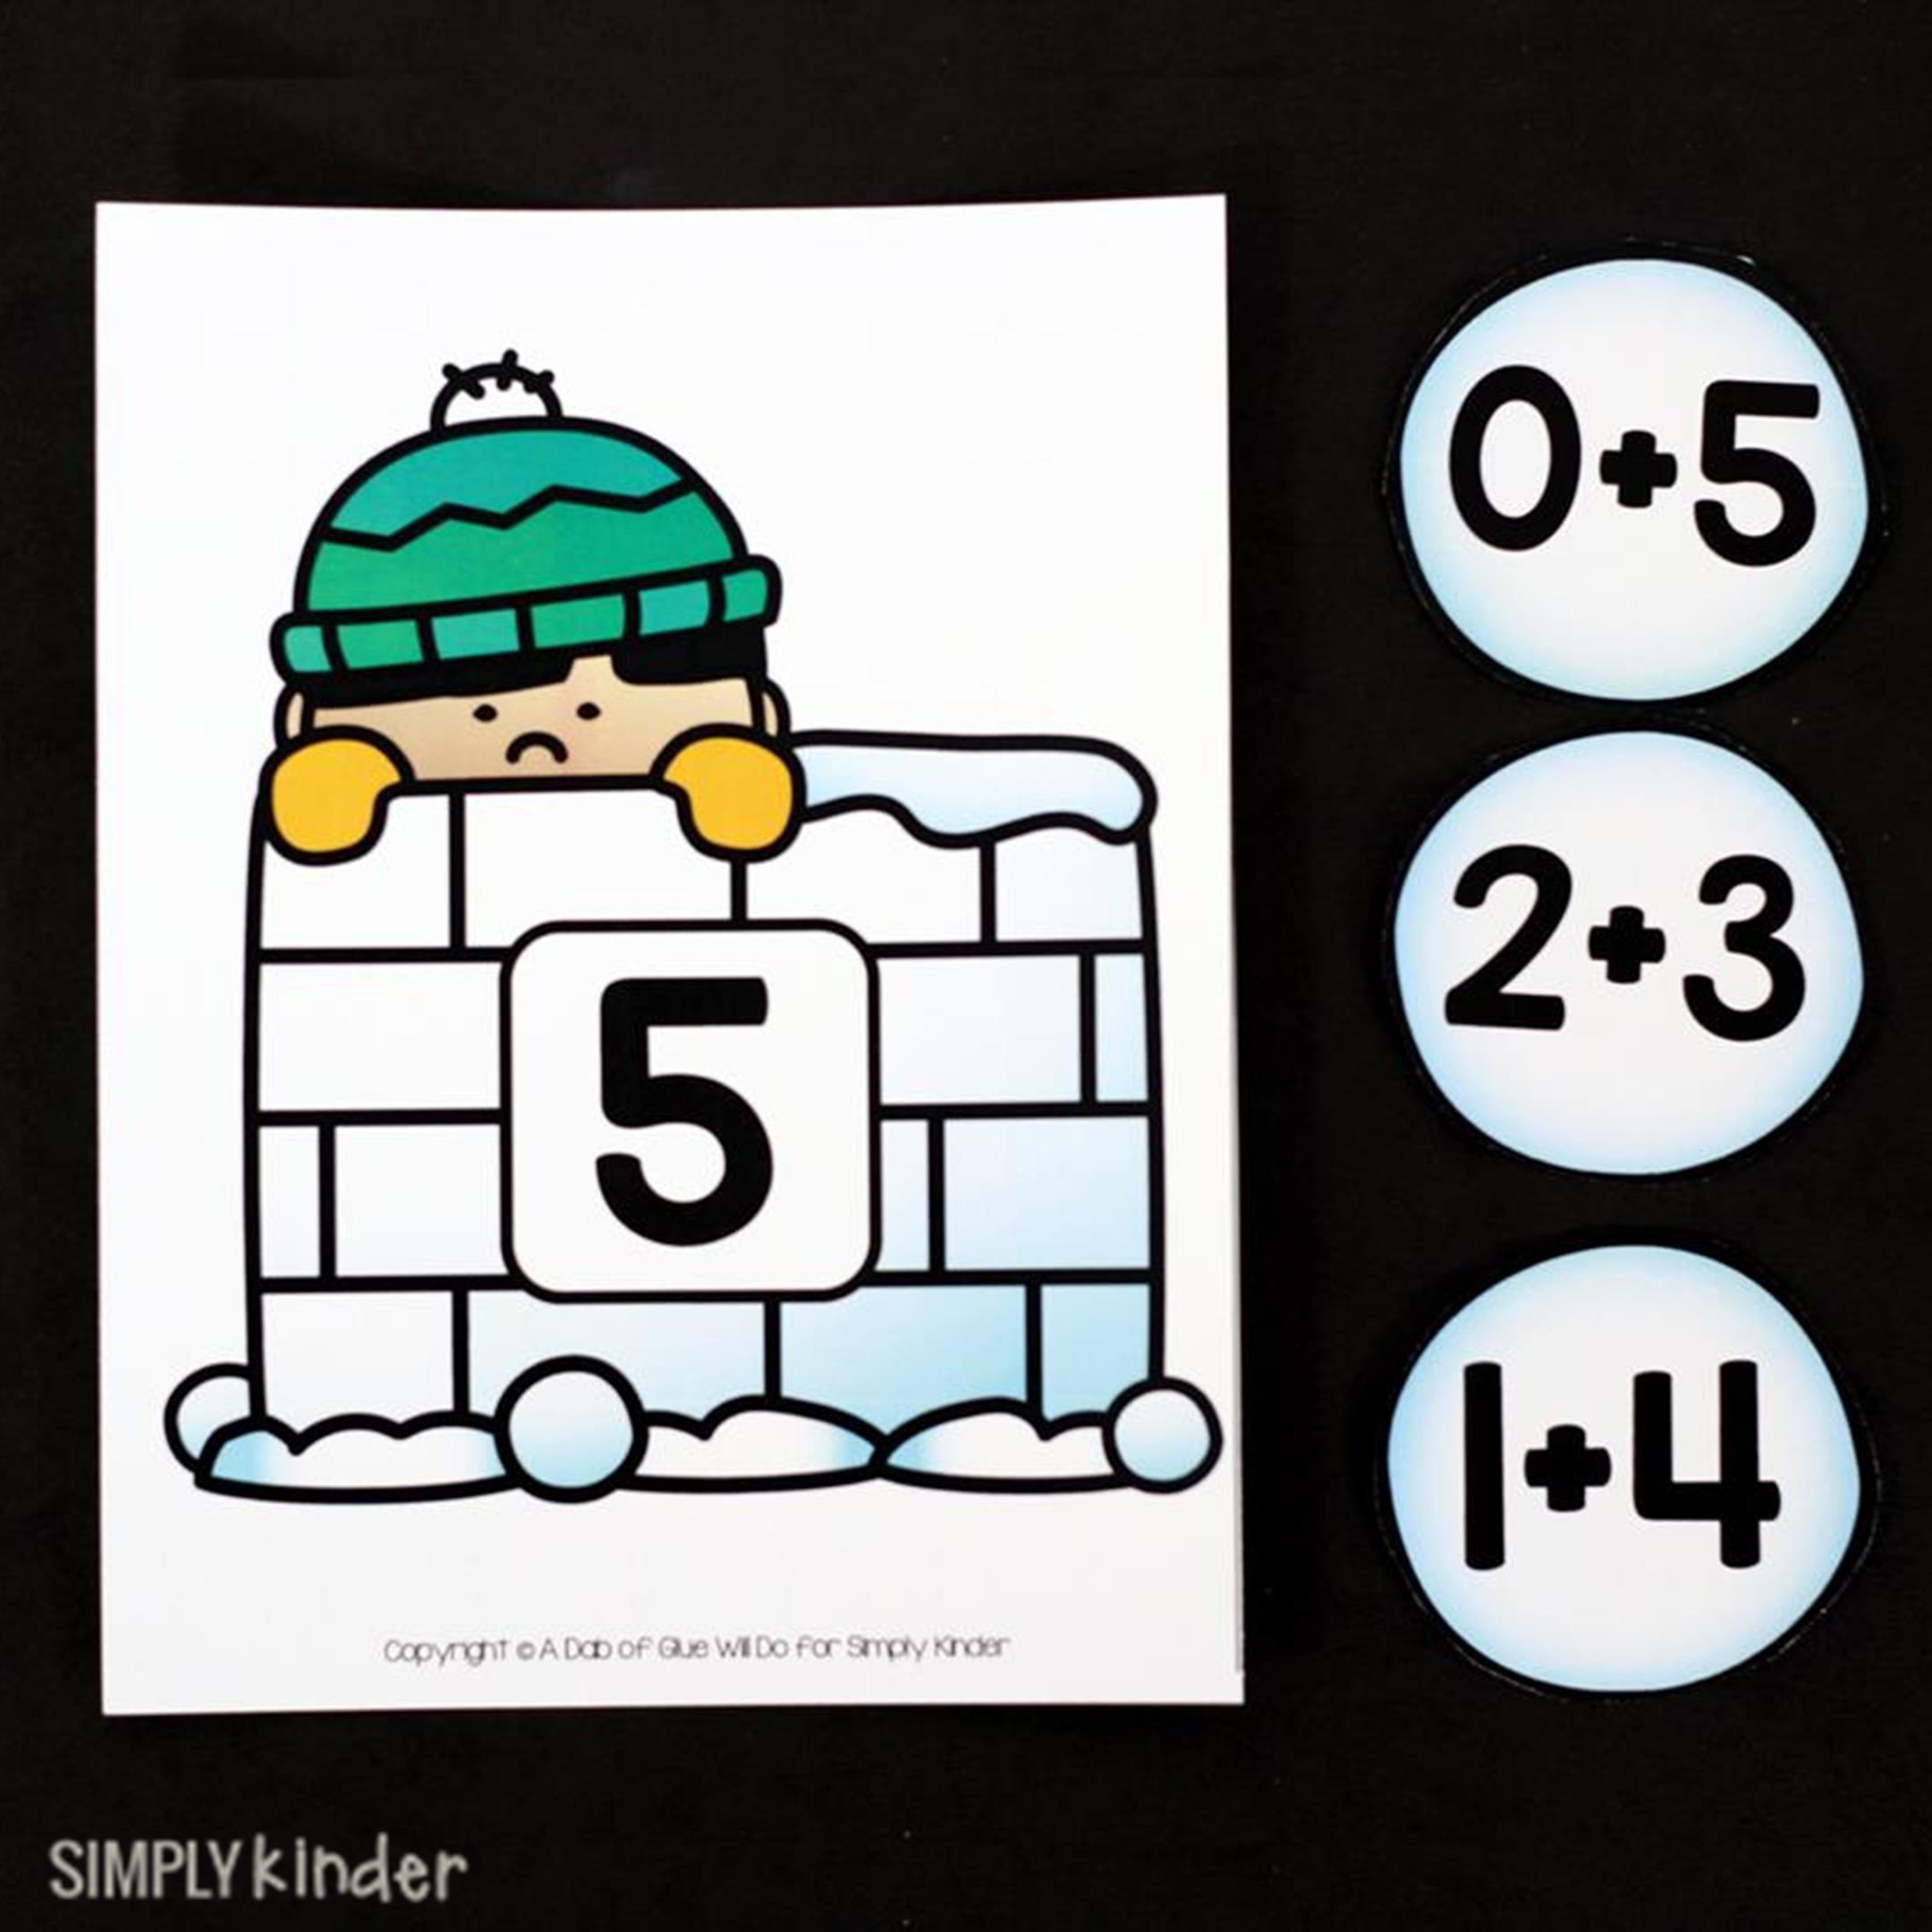 Snowball game simply kinder. Addition clipart kindergarten math